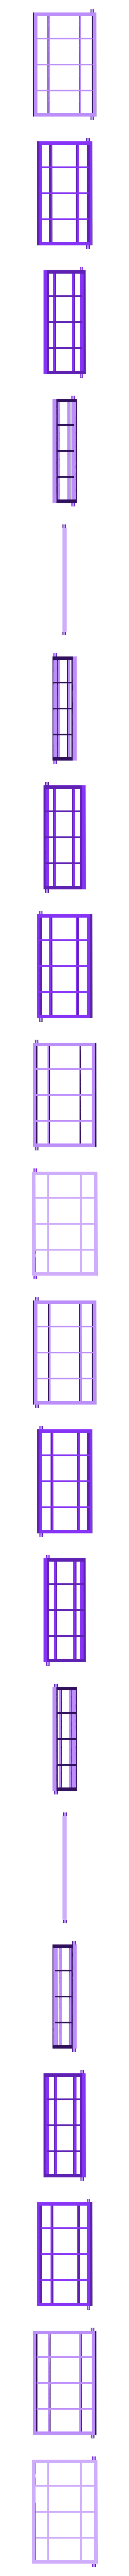 door1.stl Download free STL file Cereal box, Loft house • 3D print template, Steedrick